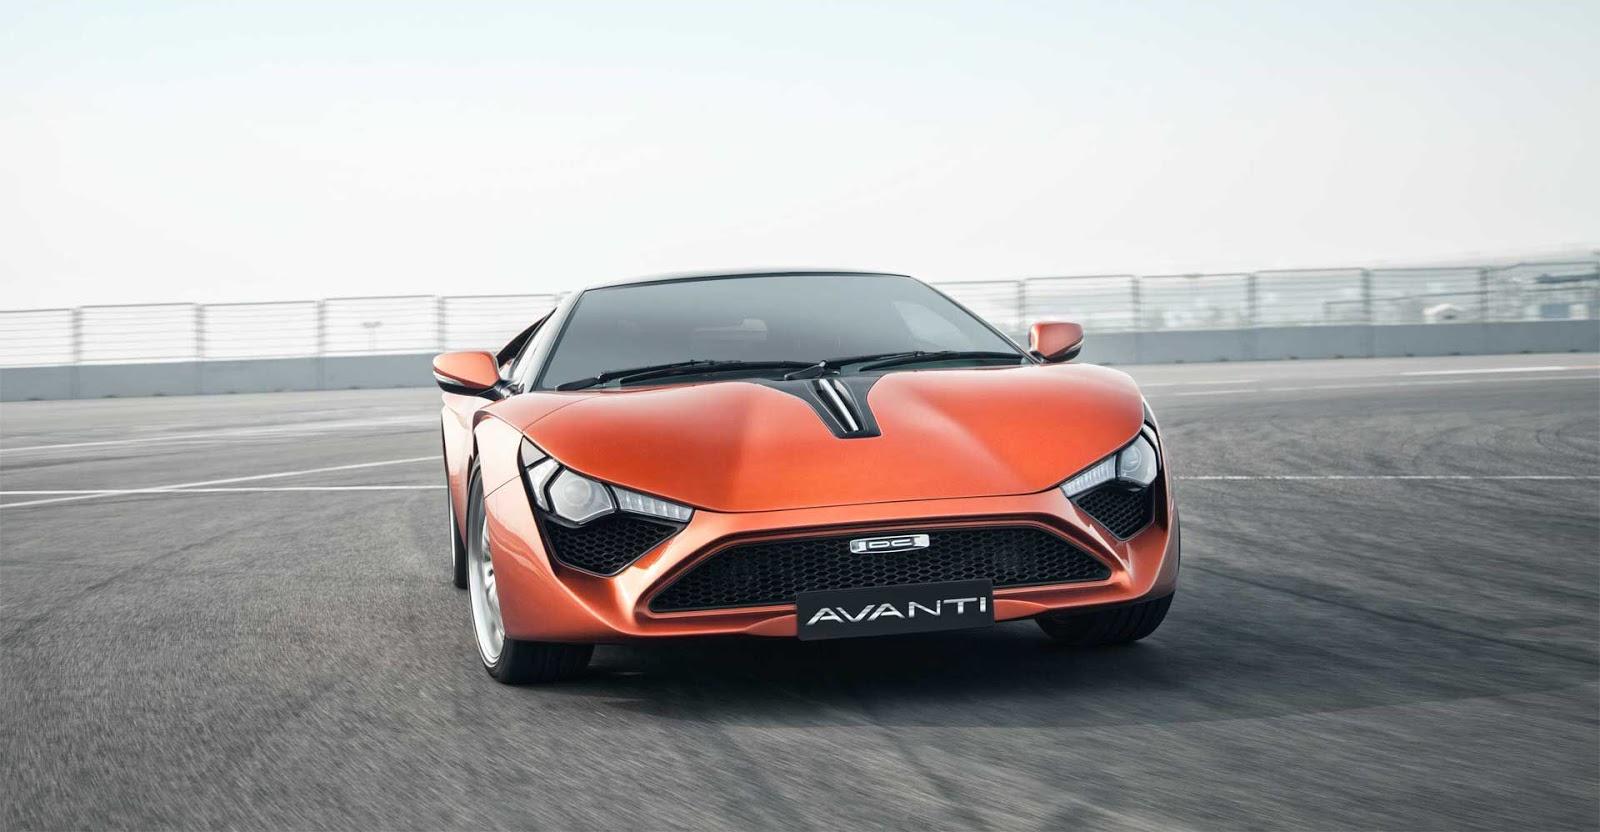 Dc Avanti Sports Car By Dc Design India